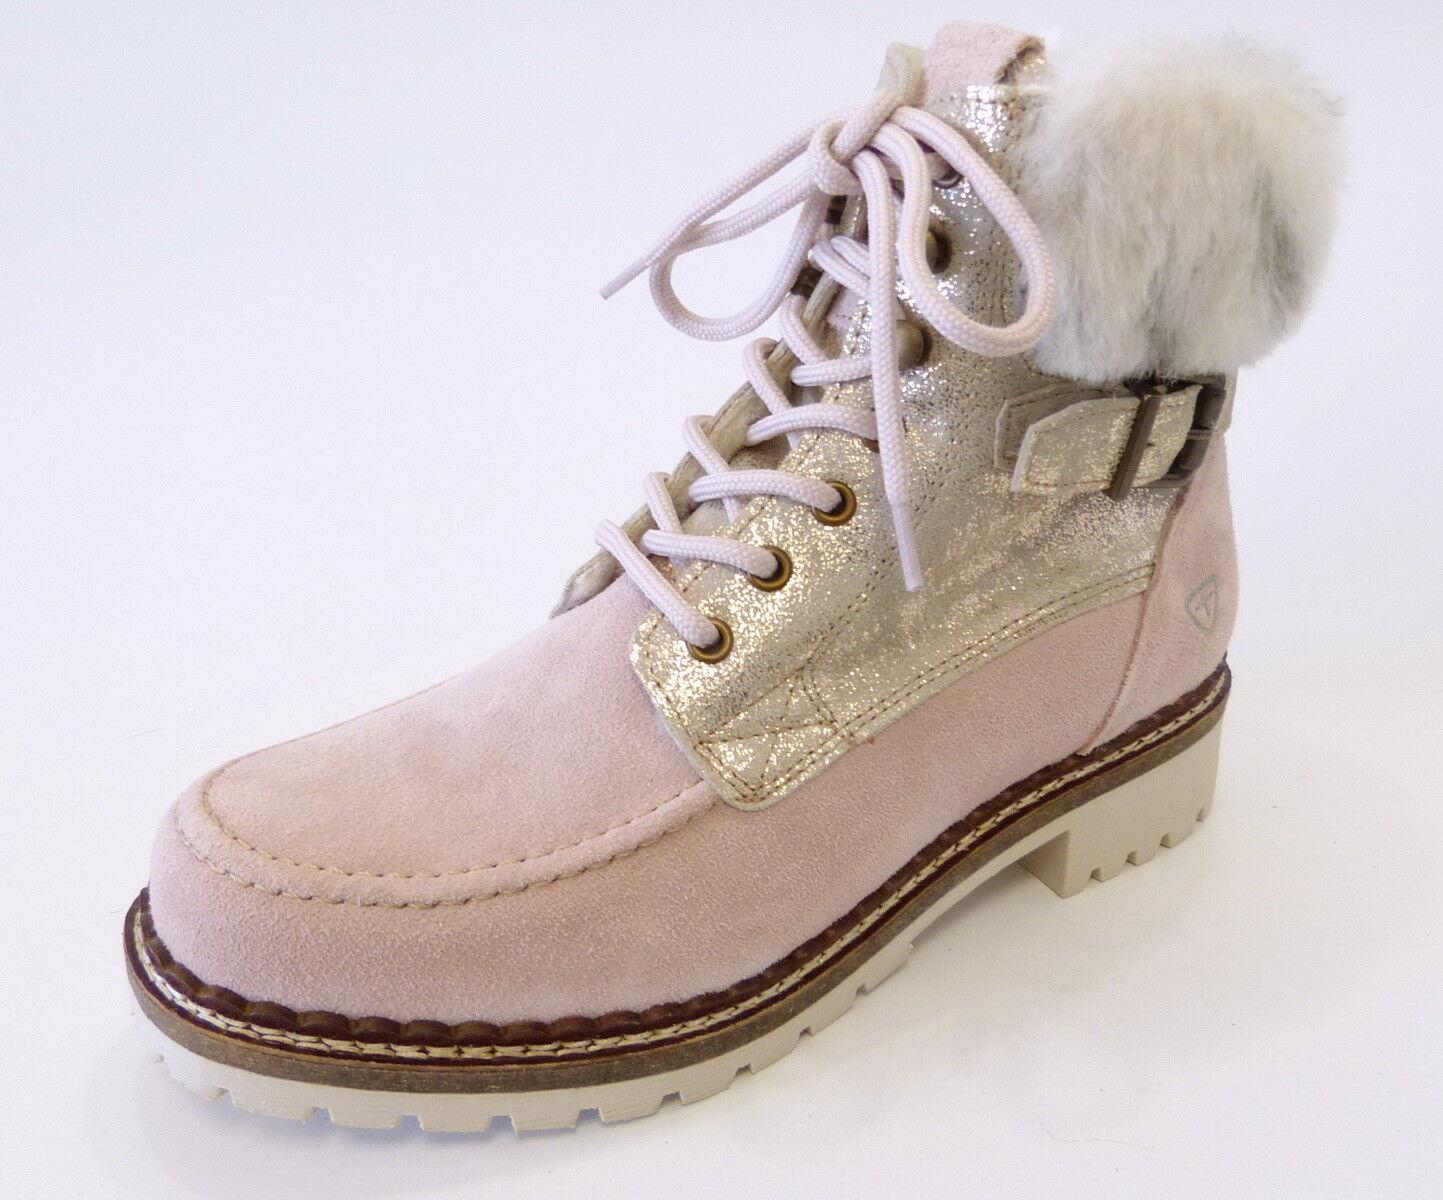 Tamaris Stiefel Stiefel 26076 554 light Rosa Rosa warm  Wolle Futter Nubuk Leder      Großhandel